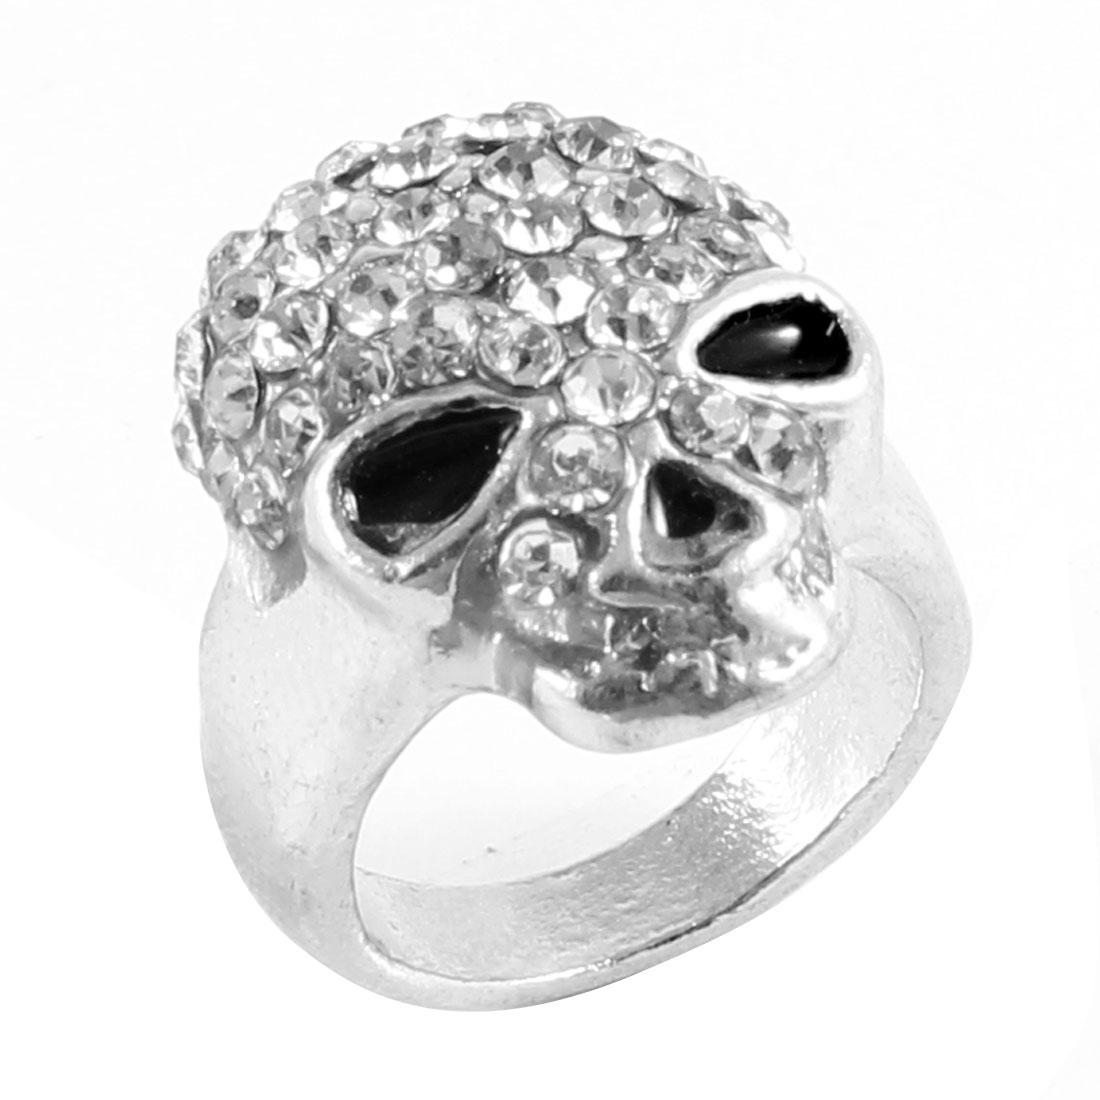 US 4 1/2 Silver Tone Metal Faux Rhinestones Inlaid Skull Shape Finger Ring